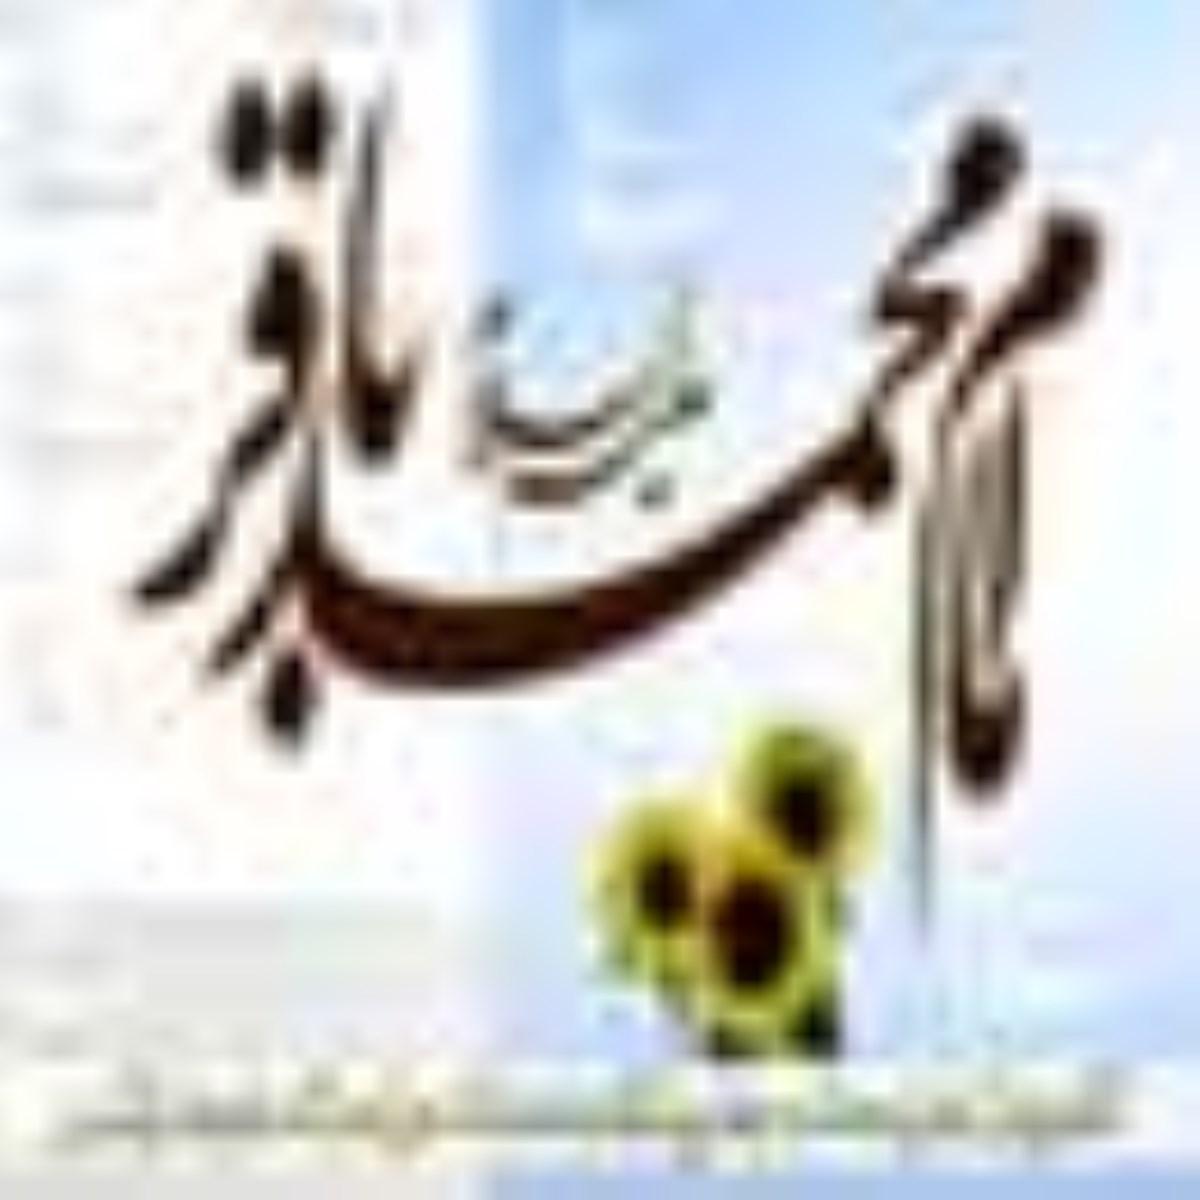 سخنان حكمت آميز حضرت امام محمد باقر (علیه السلام)